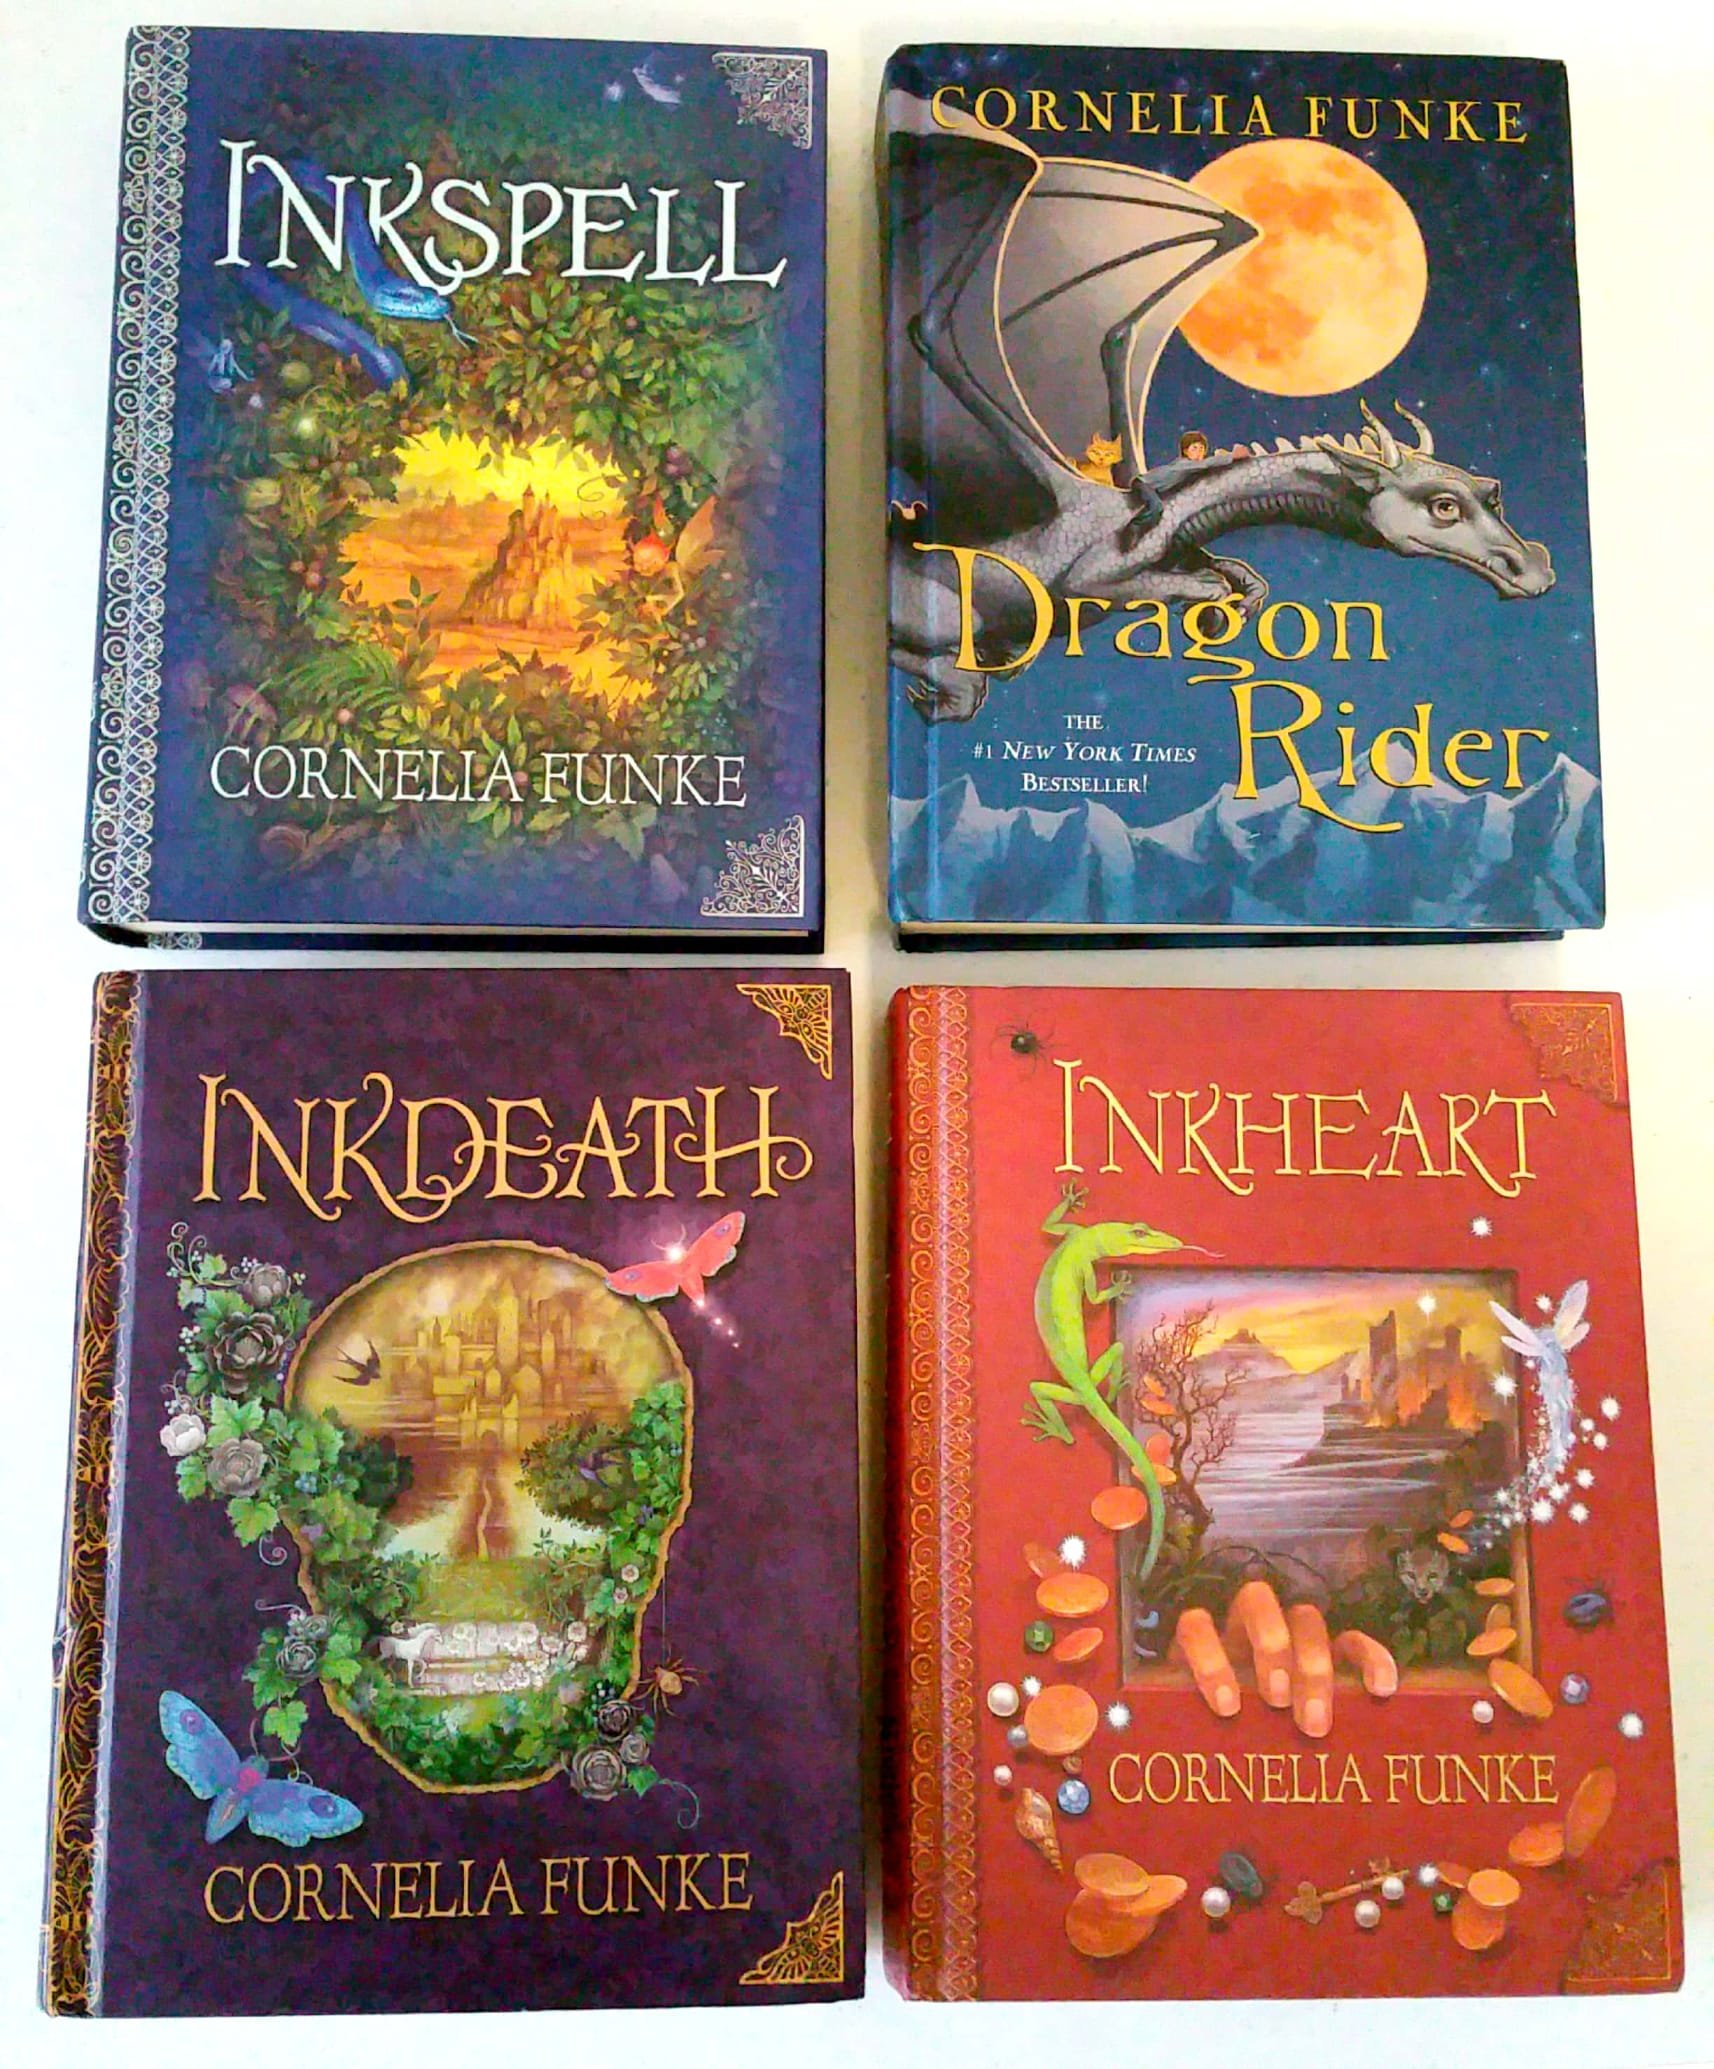 Set of 4 inkheart inkspell inkdeath dragon rider books cornelia set of 4 inkheart inkspell inkdeath dragon rider books cornelia funke amazon books fandeluxe Choice Image